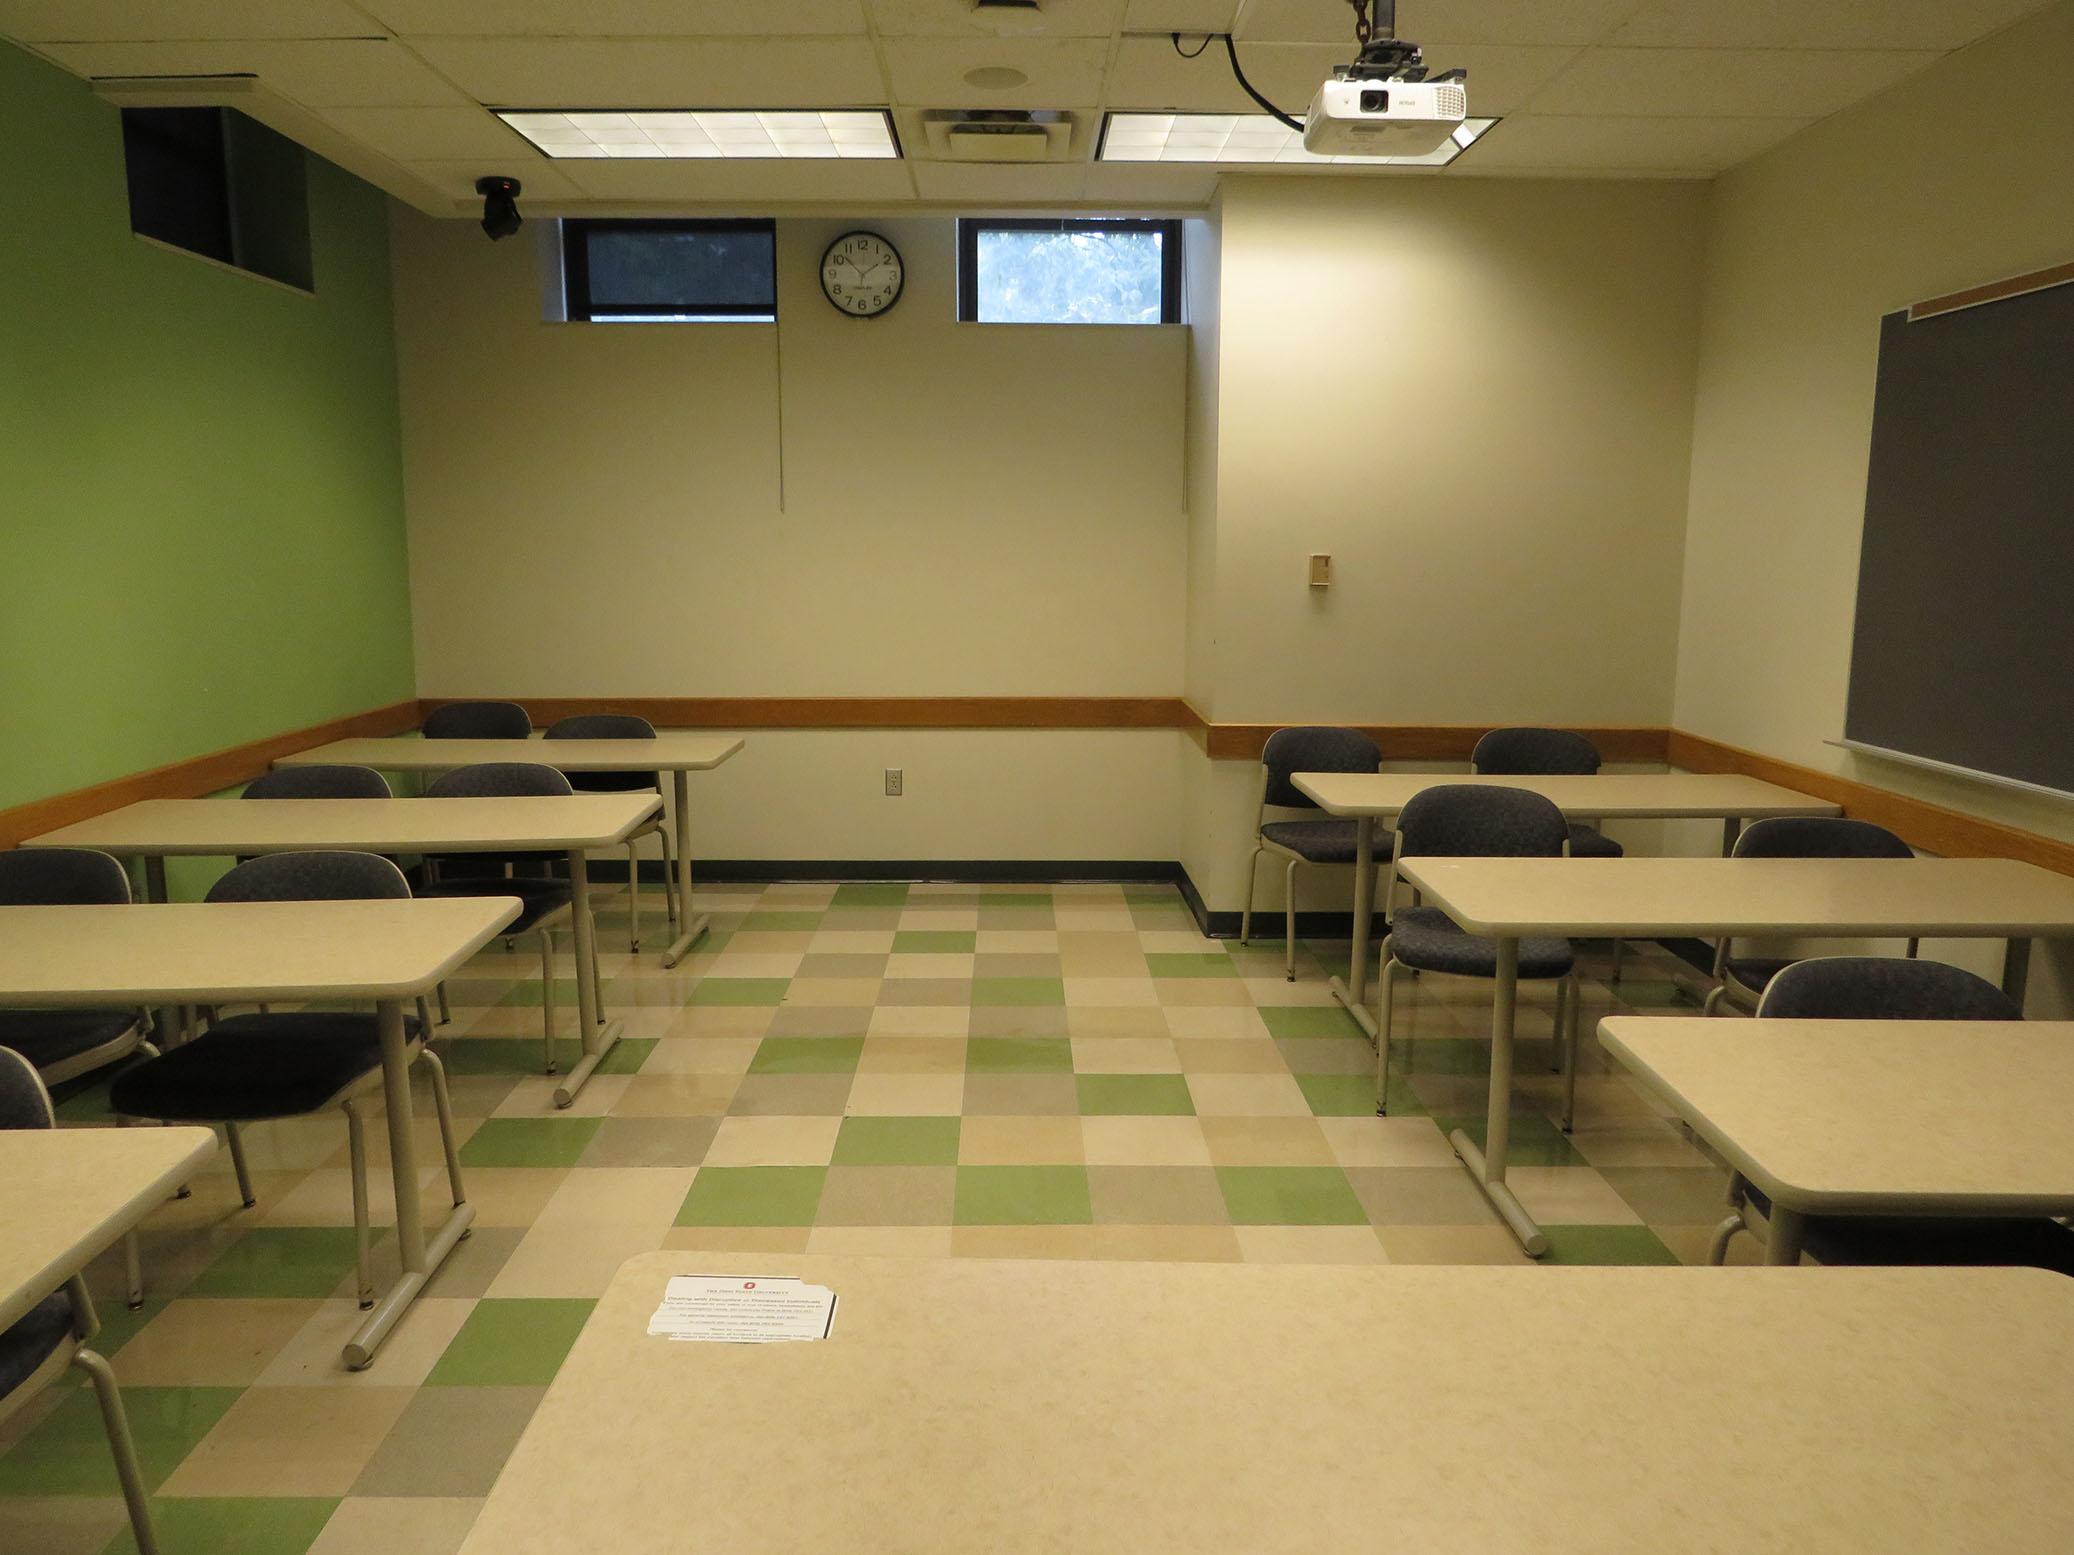 Lazenby Hall Room 018